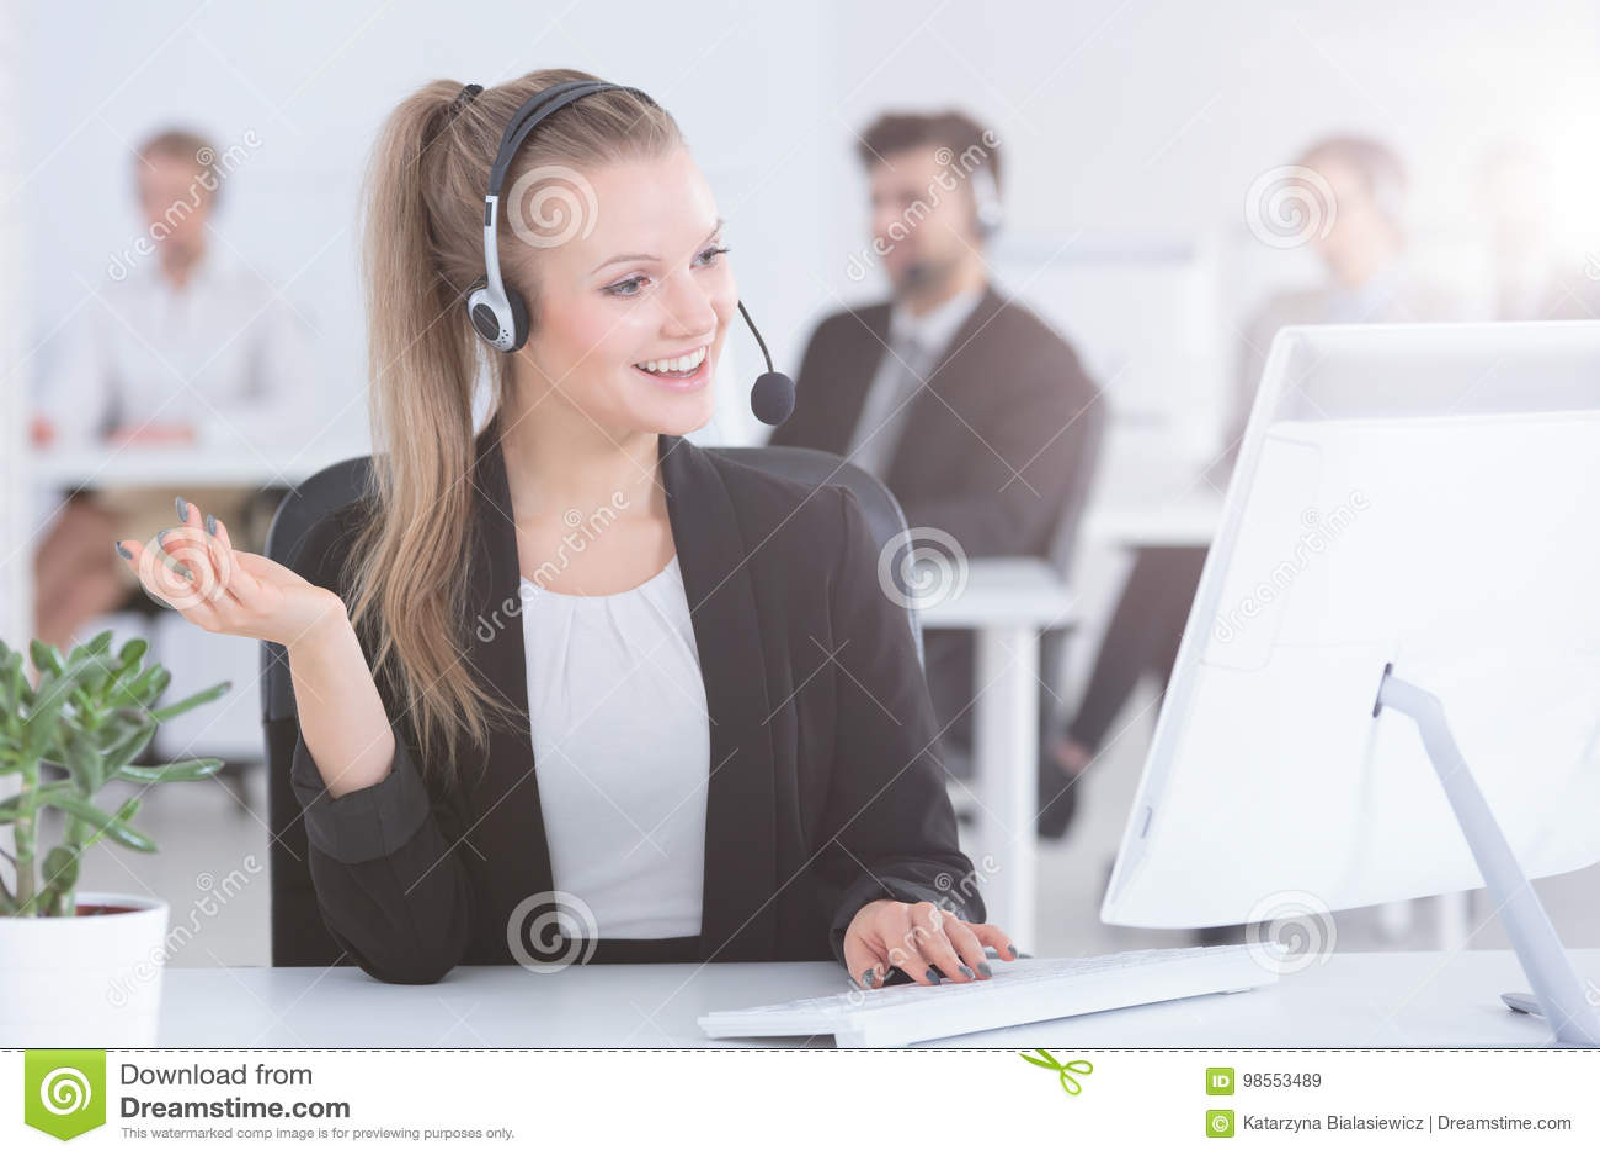 Call center agent using computer